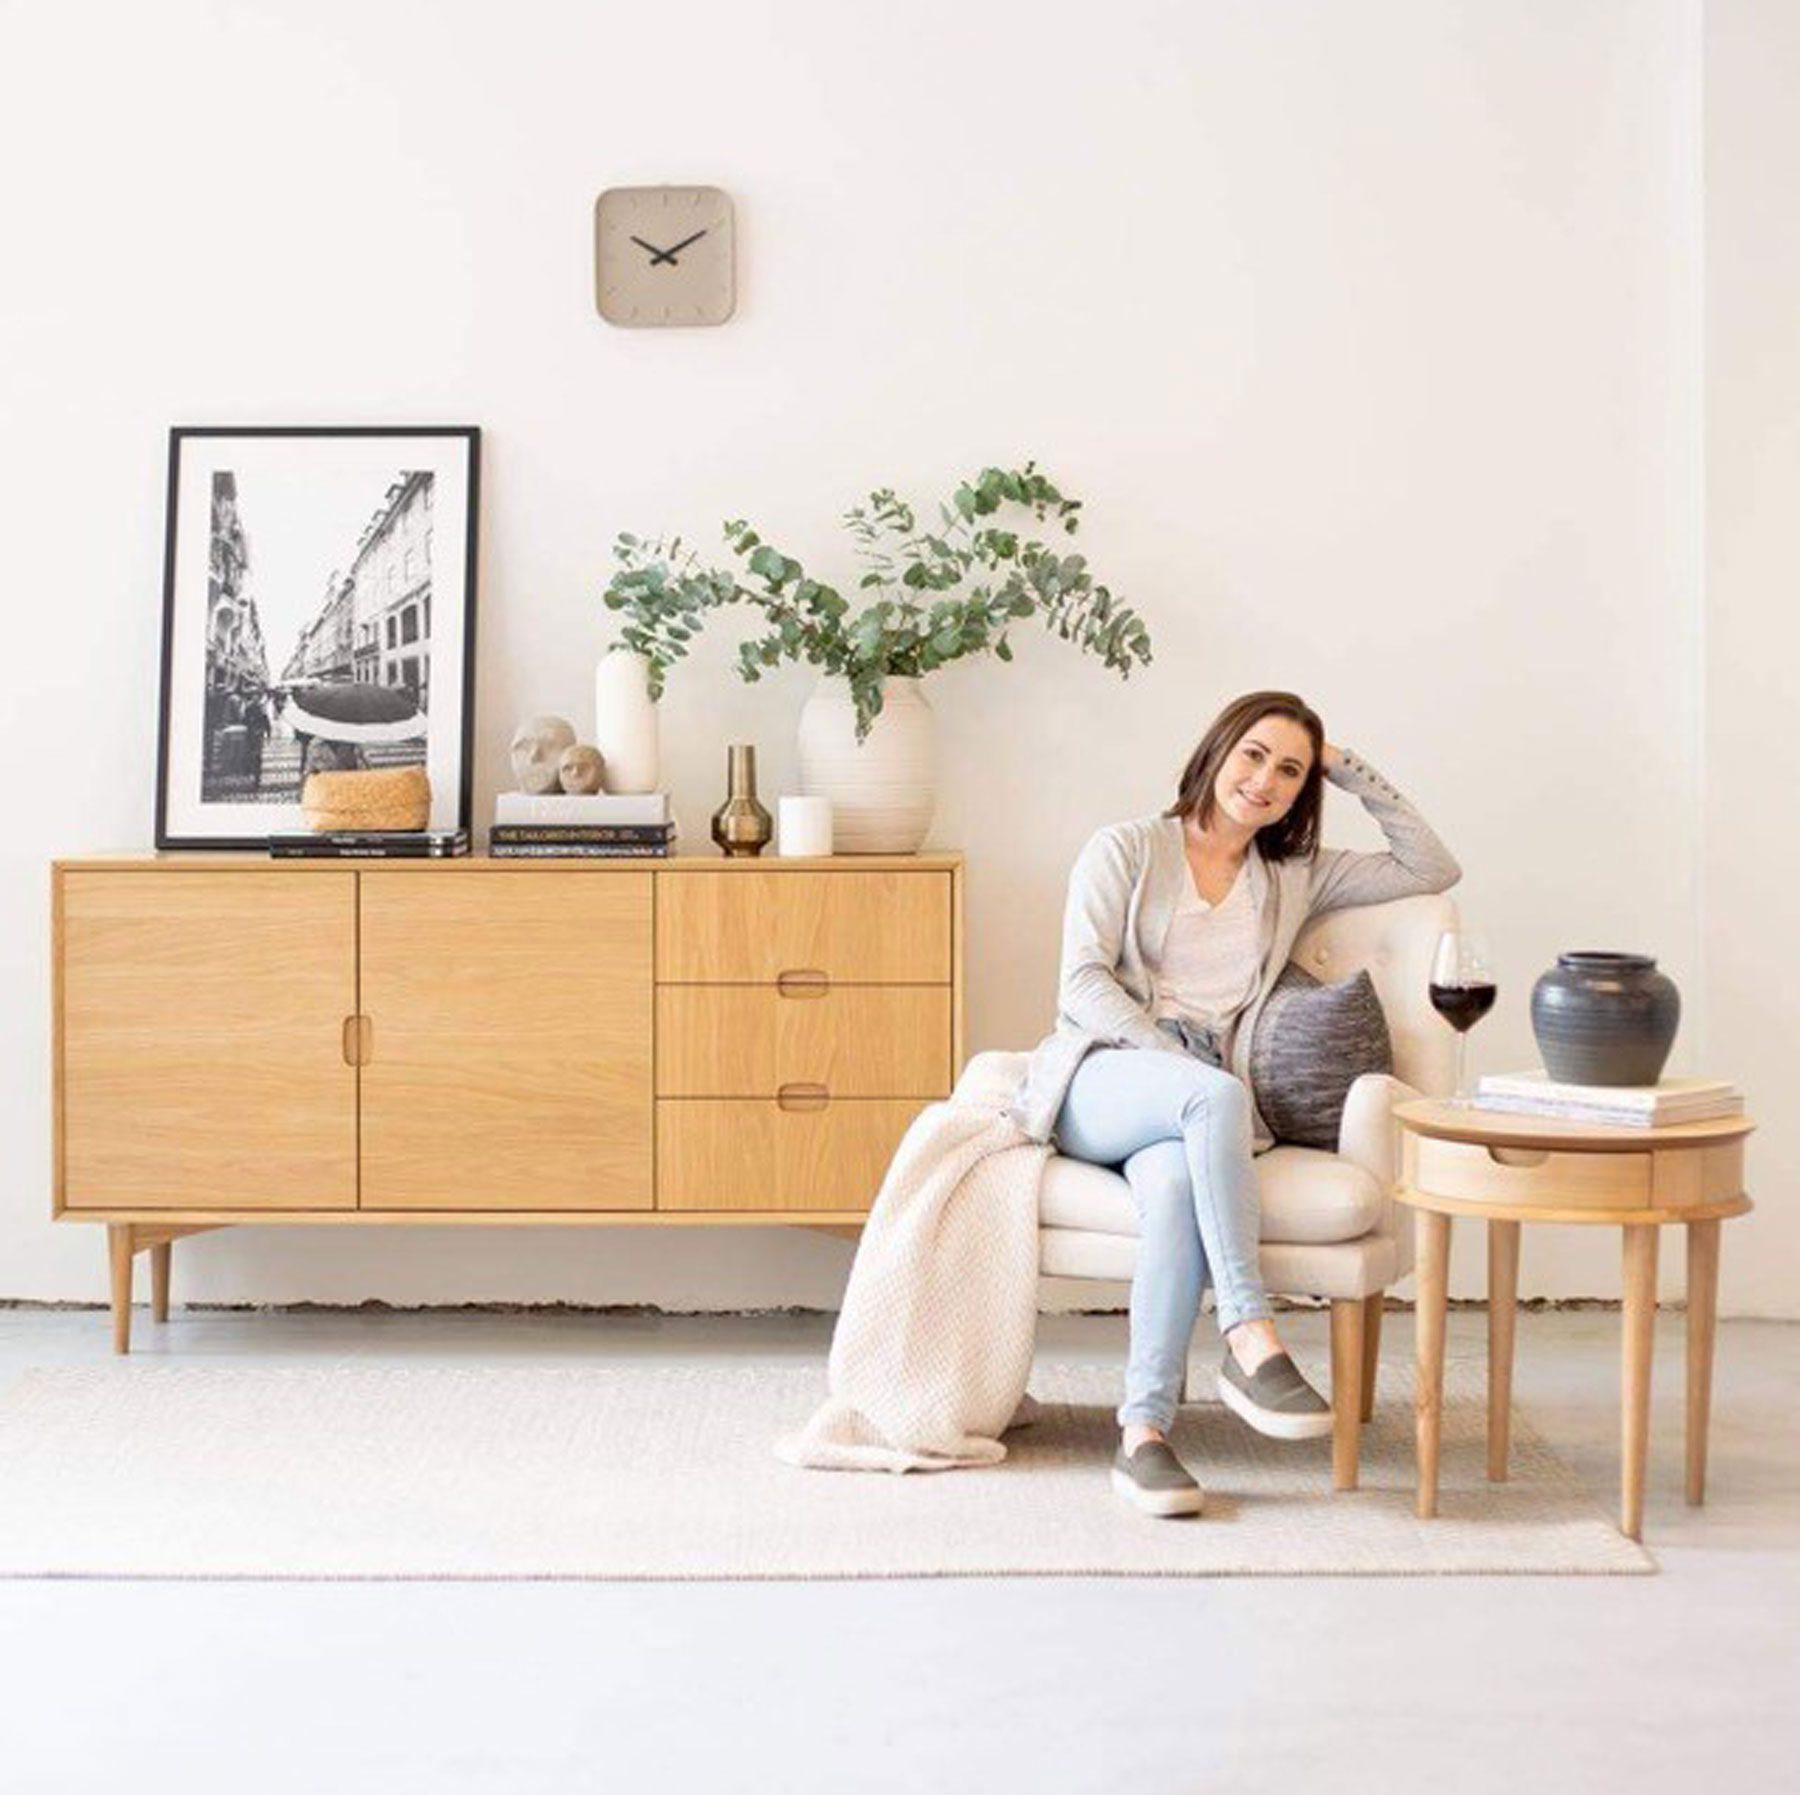 Tracey Bright, Interior Designer